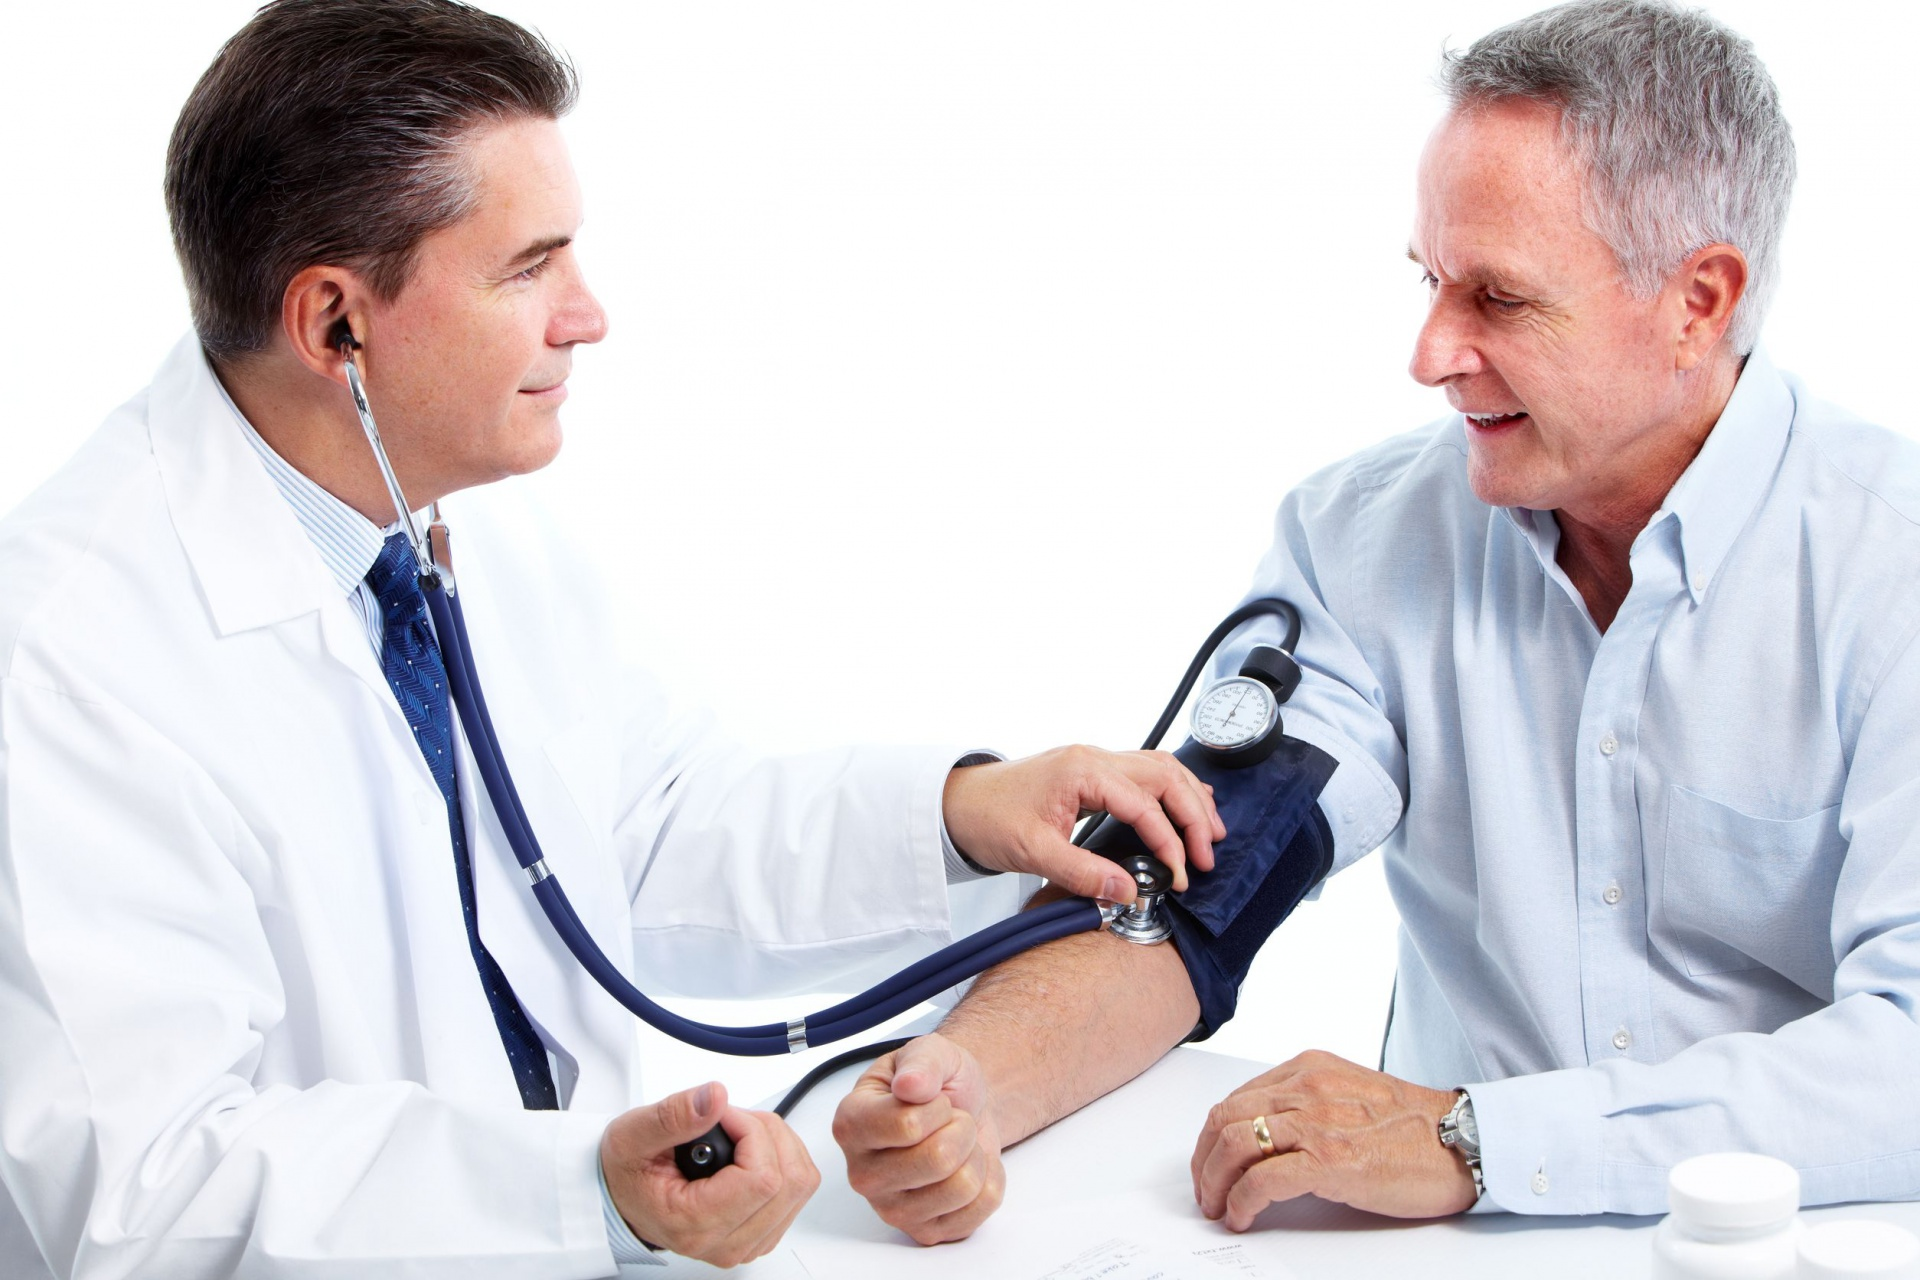 kardiológus ajánlásai magas vérnyomás esetén)